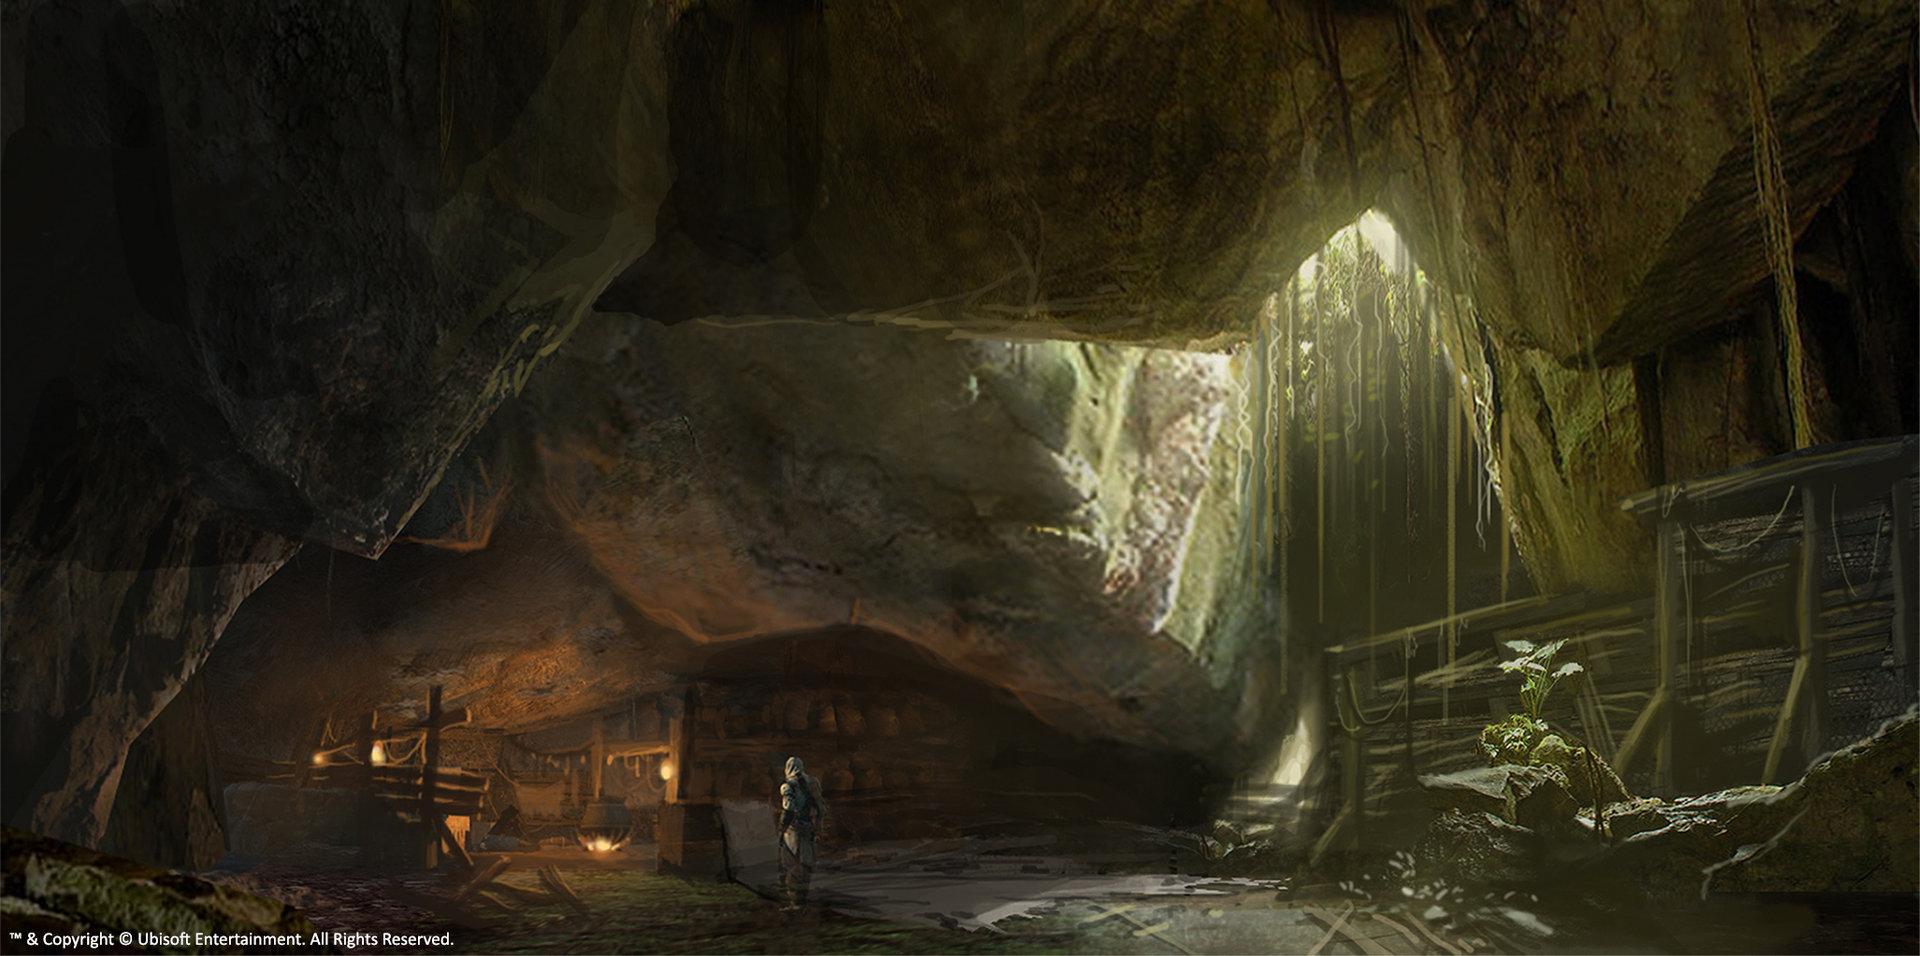 Home Design 3d Game Ideas Nick Tan Assassin S Creed 3 Concept Art Shipwreck S Cave